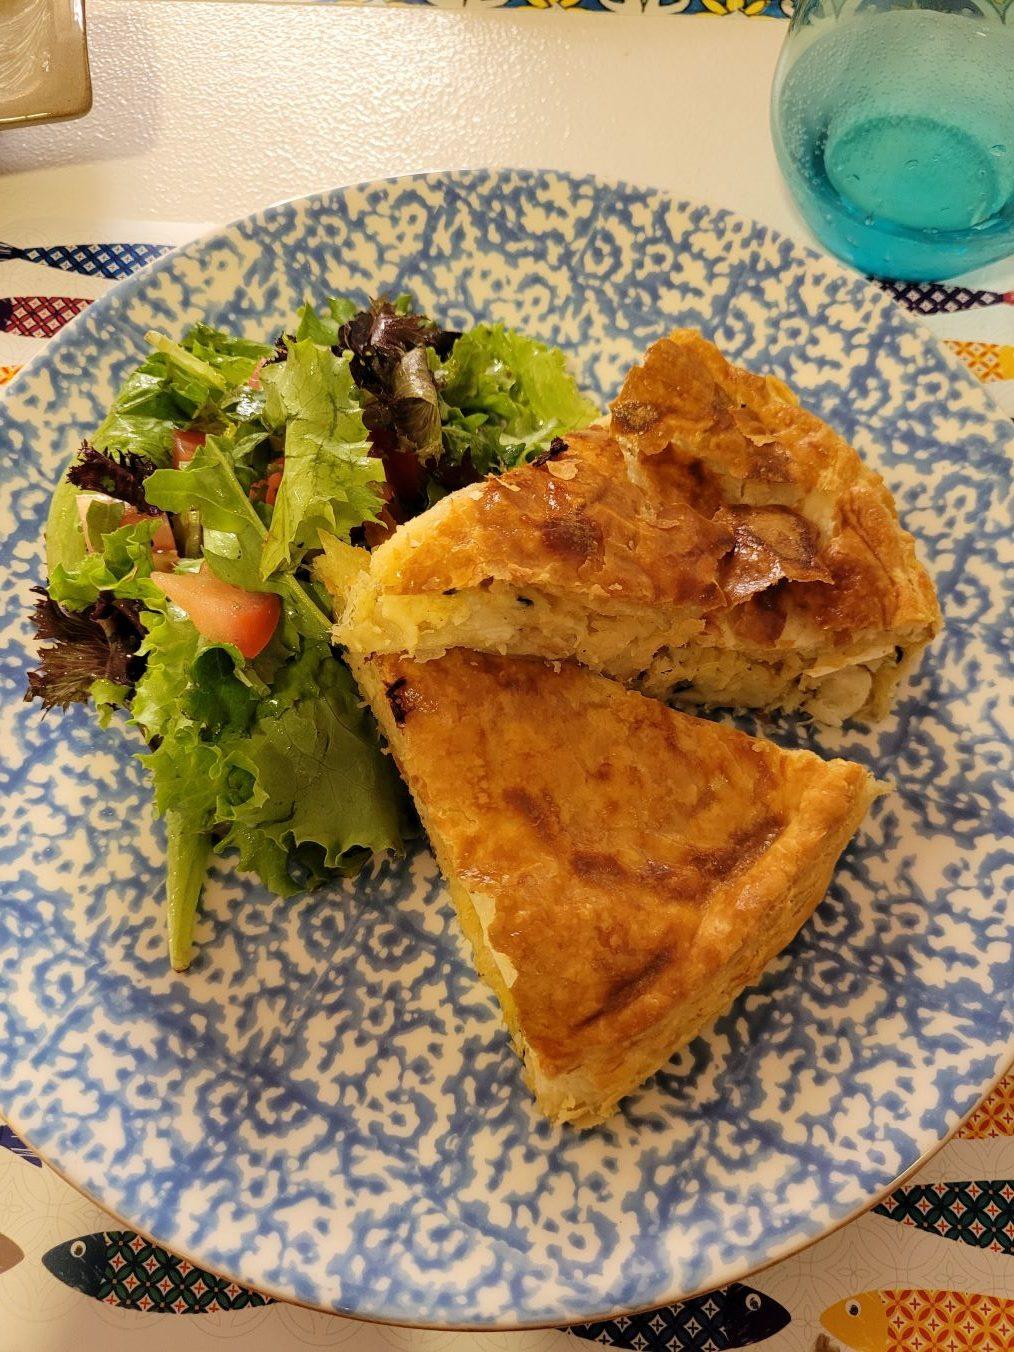 Manger à Tasca do Teimoso à Lisbonne